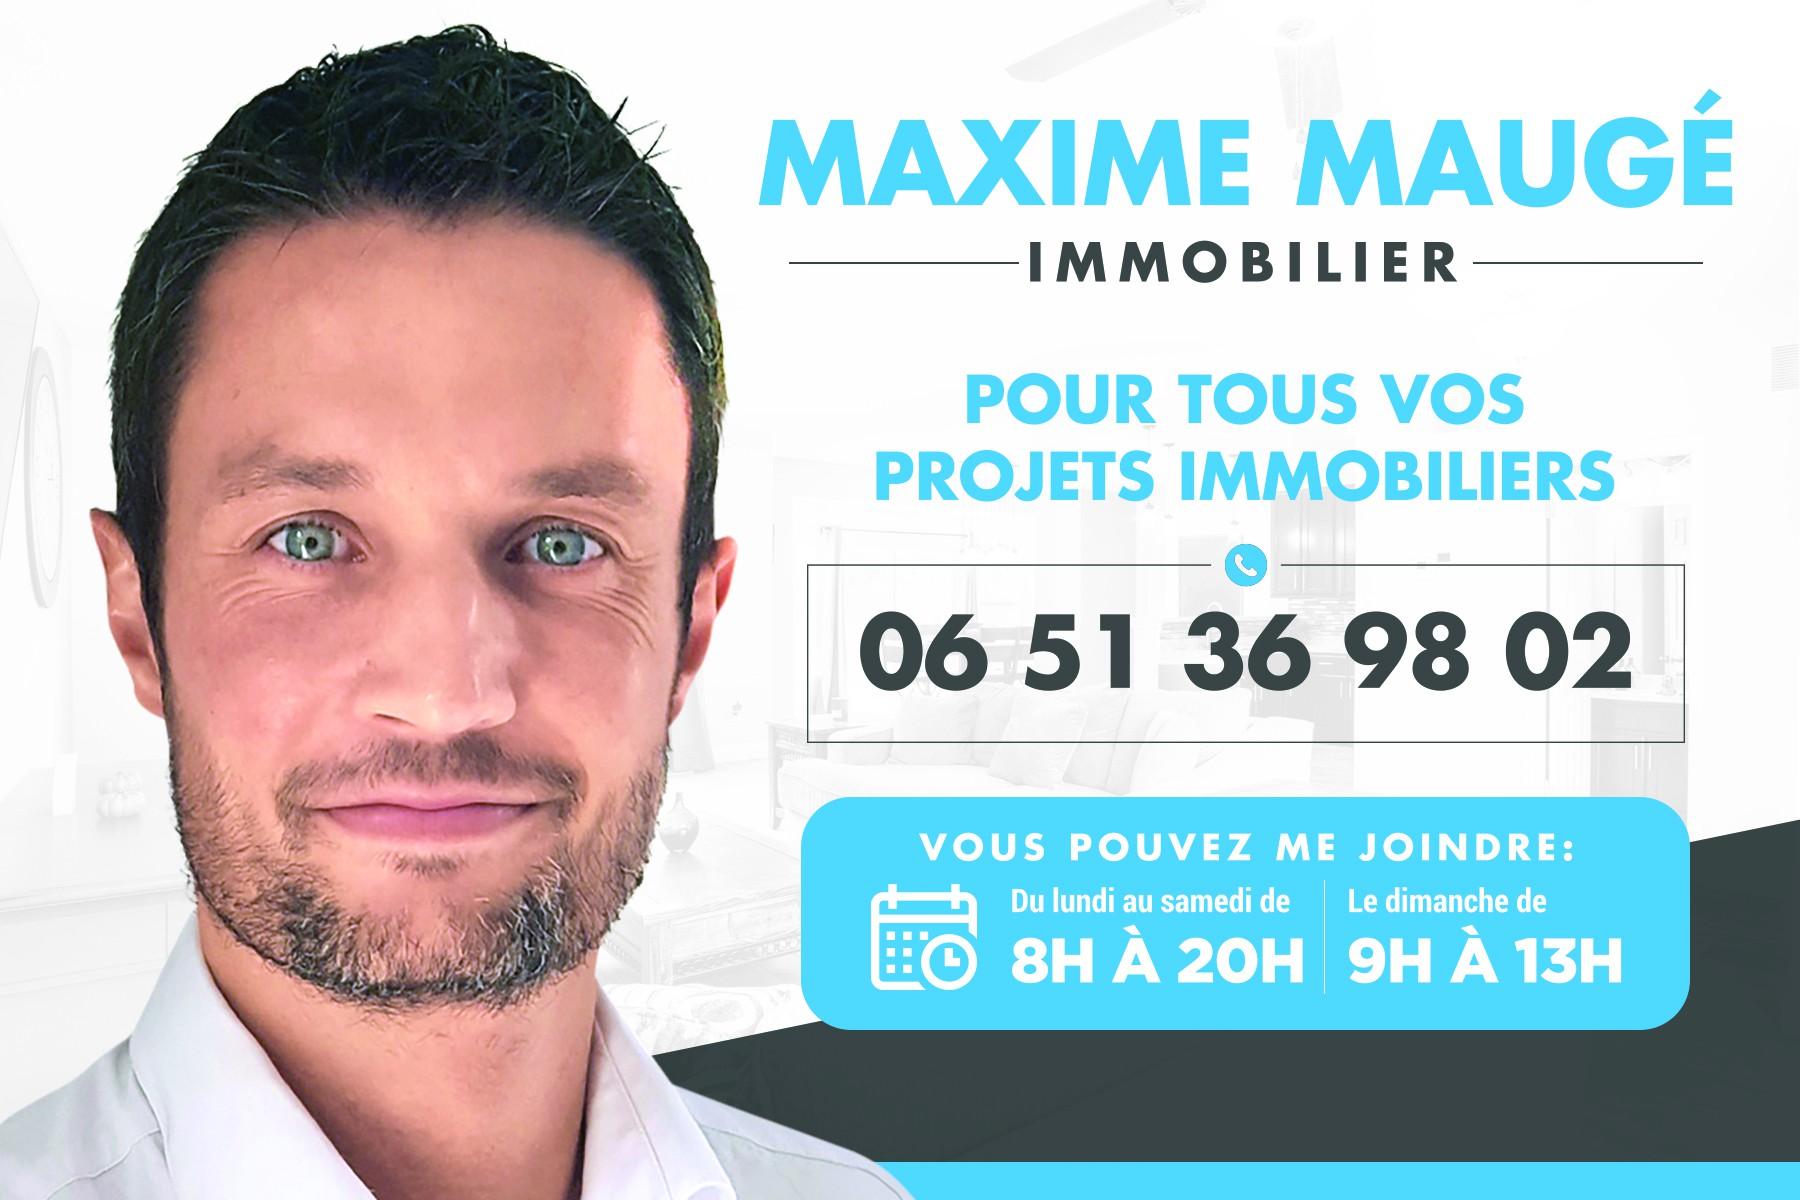 Maxime Maugé Immobilier